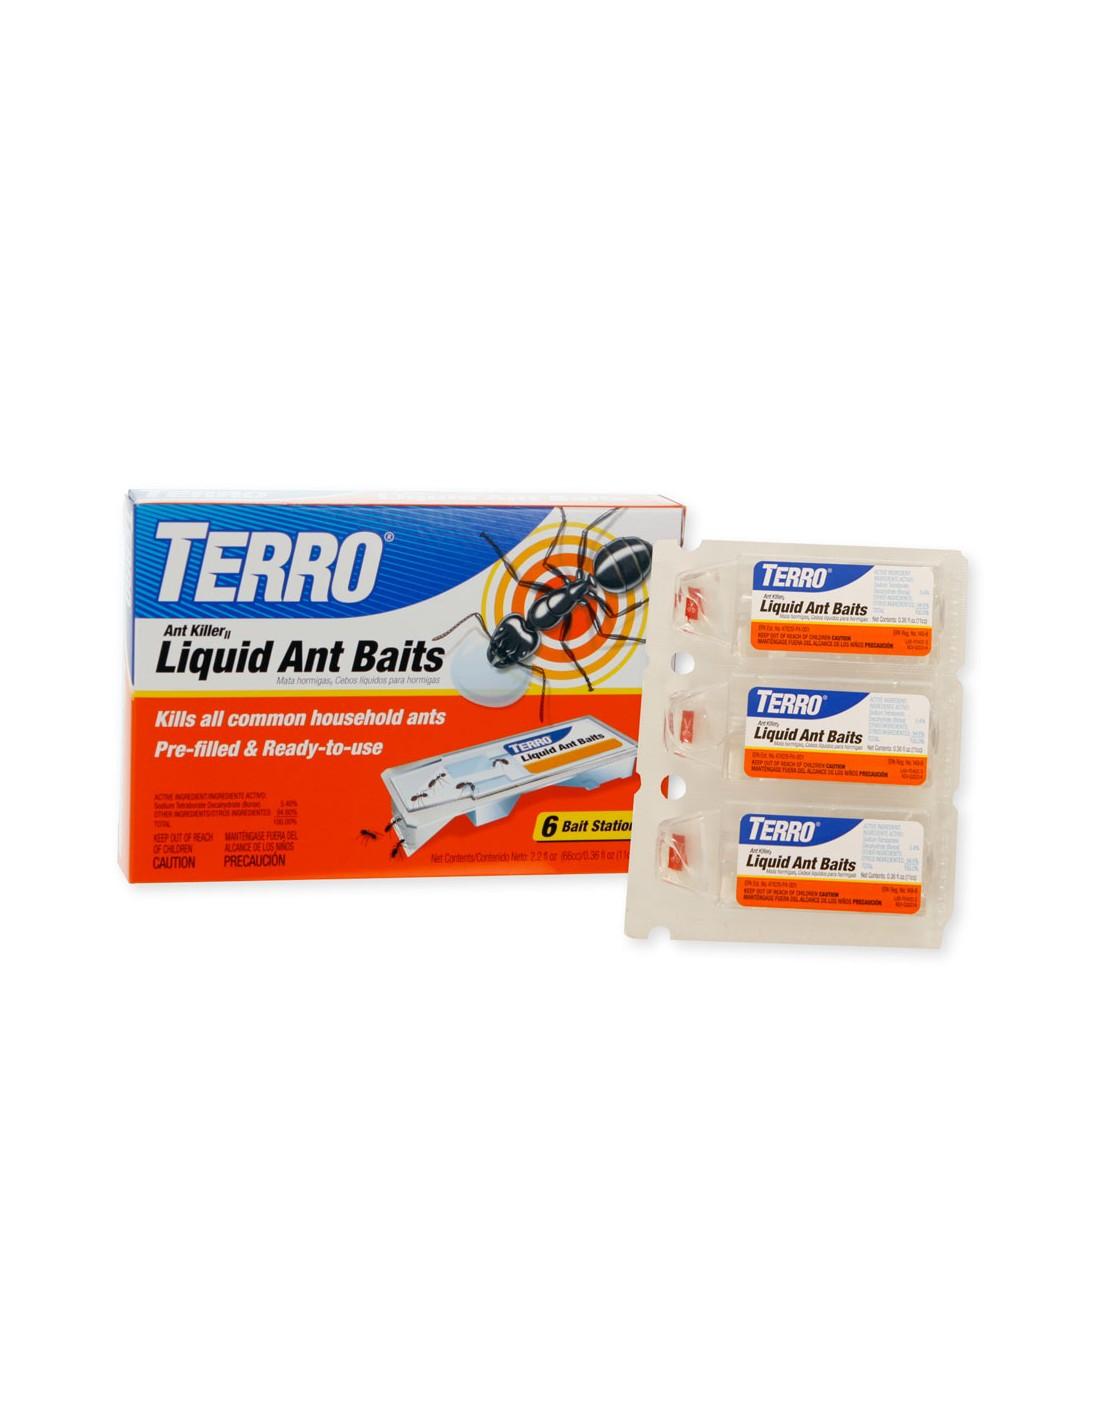 how do you open terro pco liquid ant killer